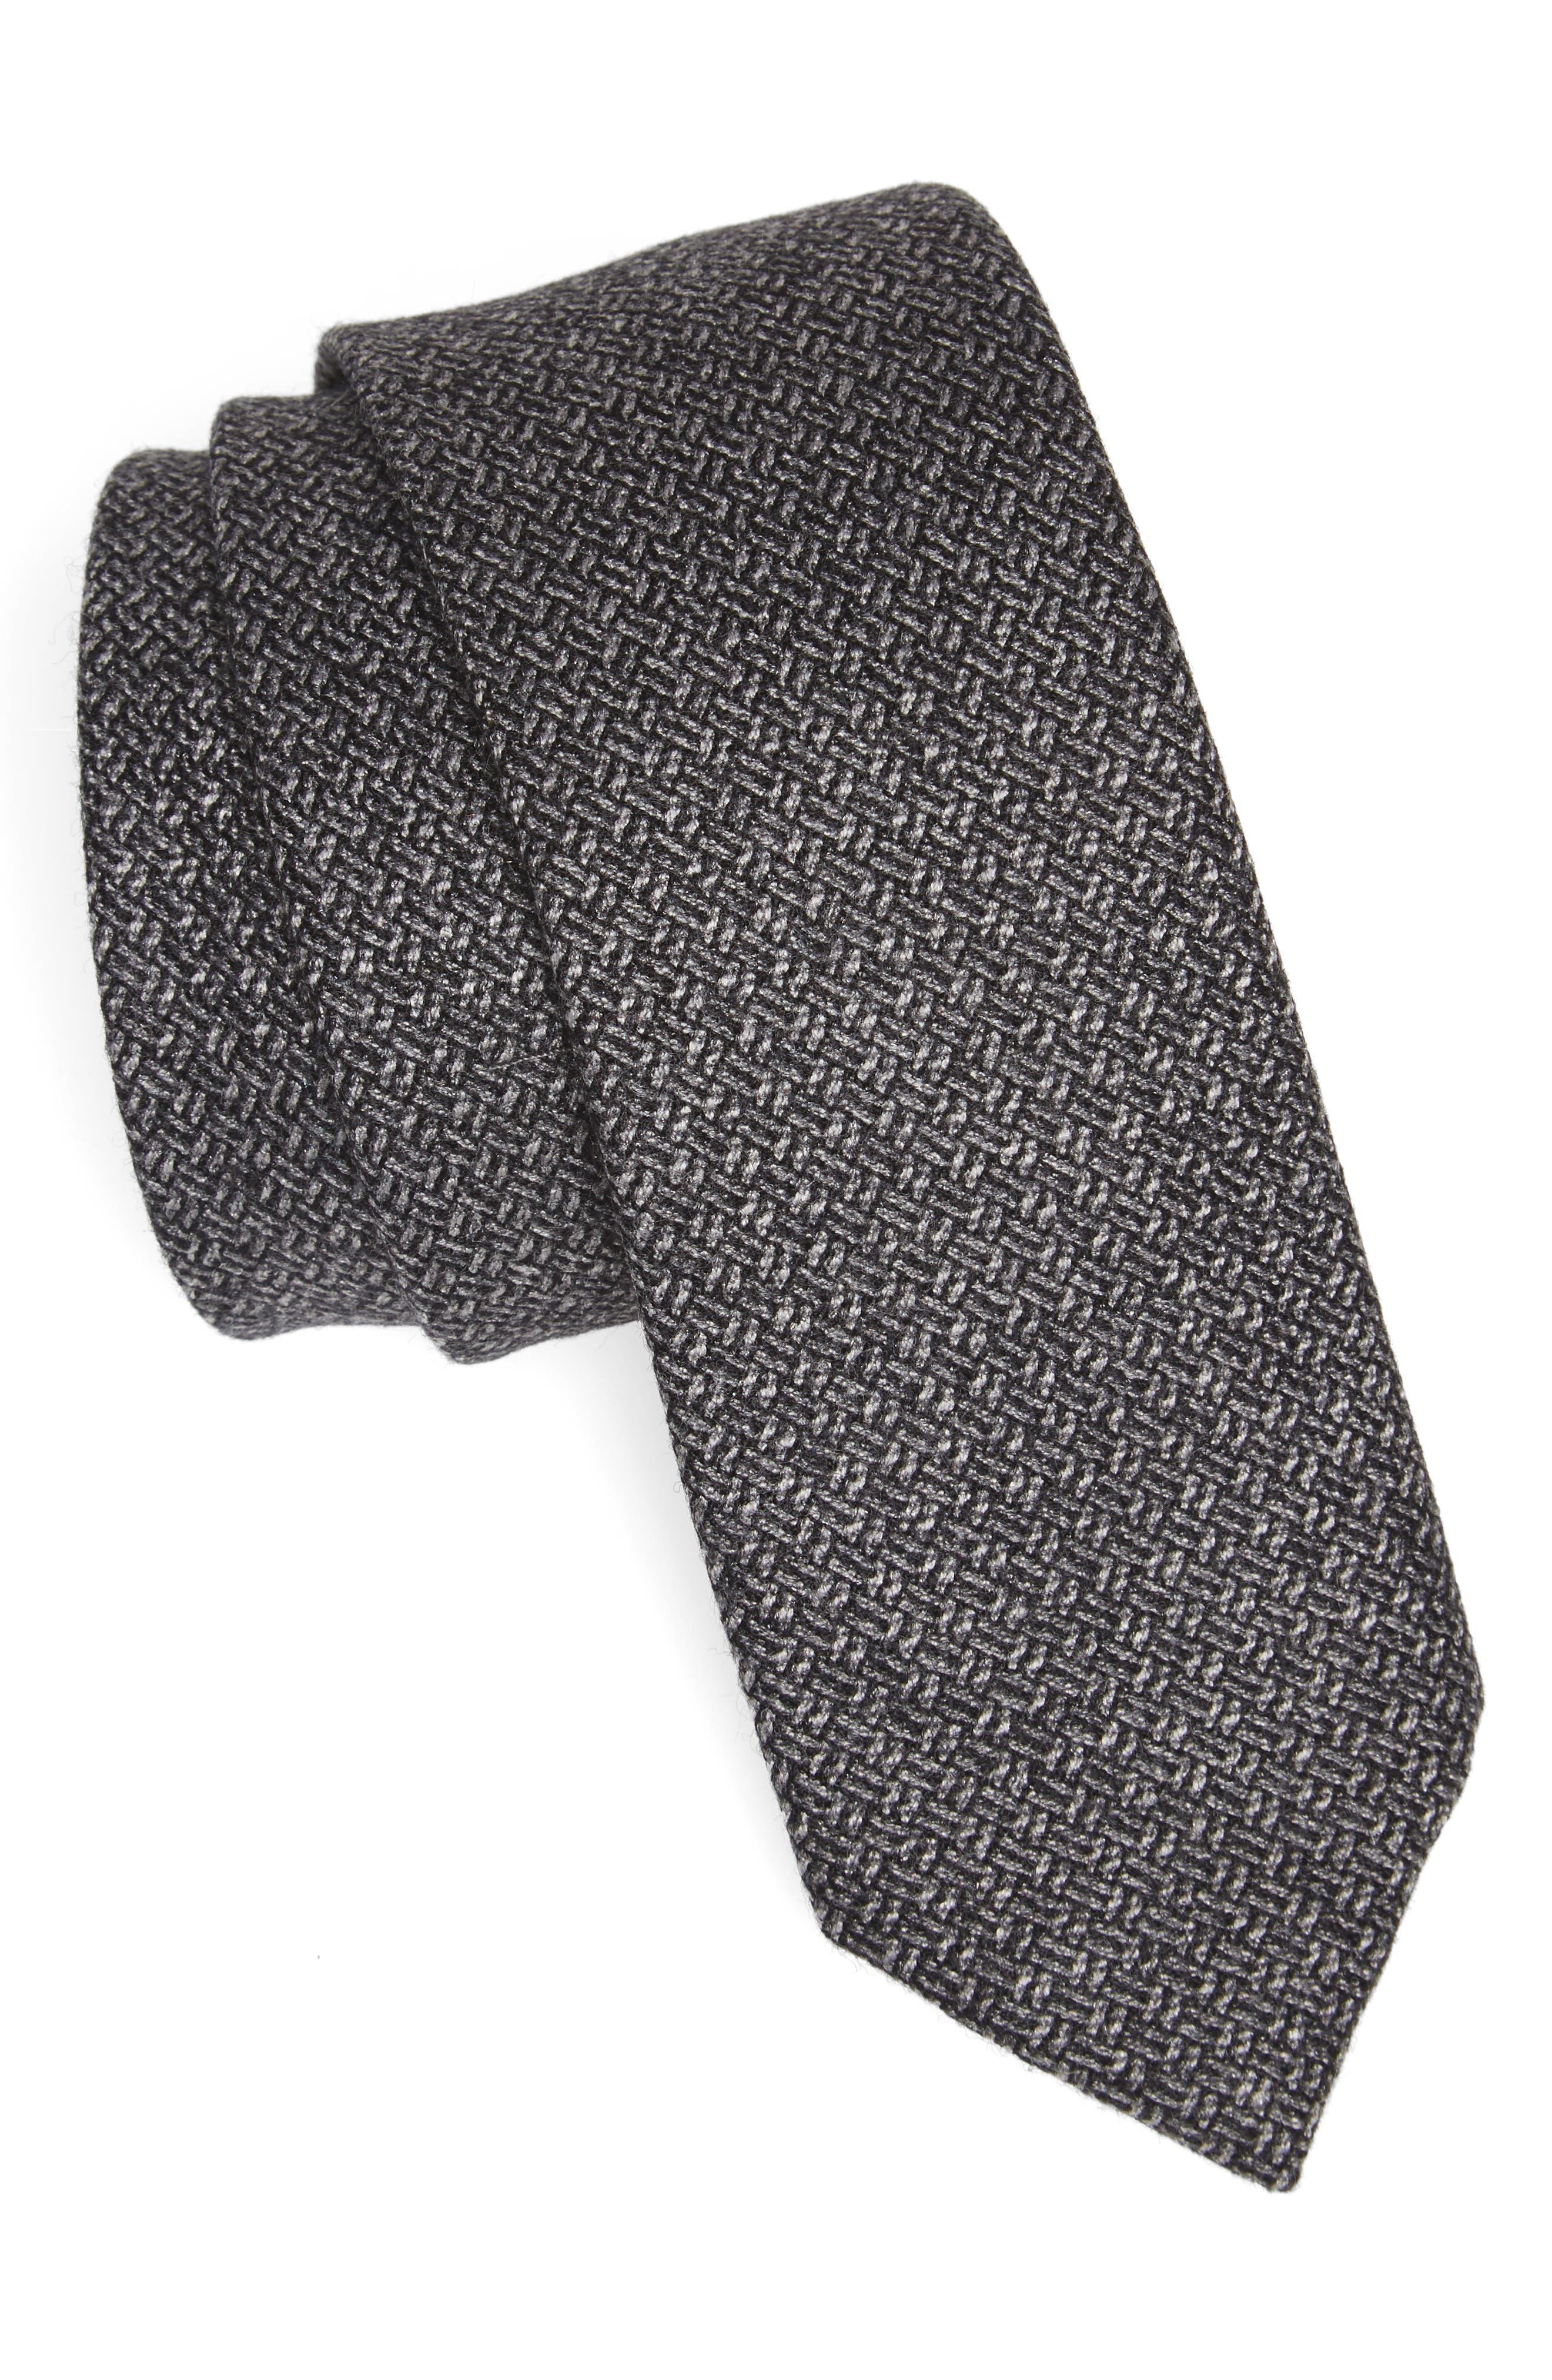 Blackboard Wool Skinny Tie,                             Main thumbnail 1, color,                             Grey